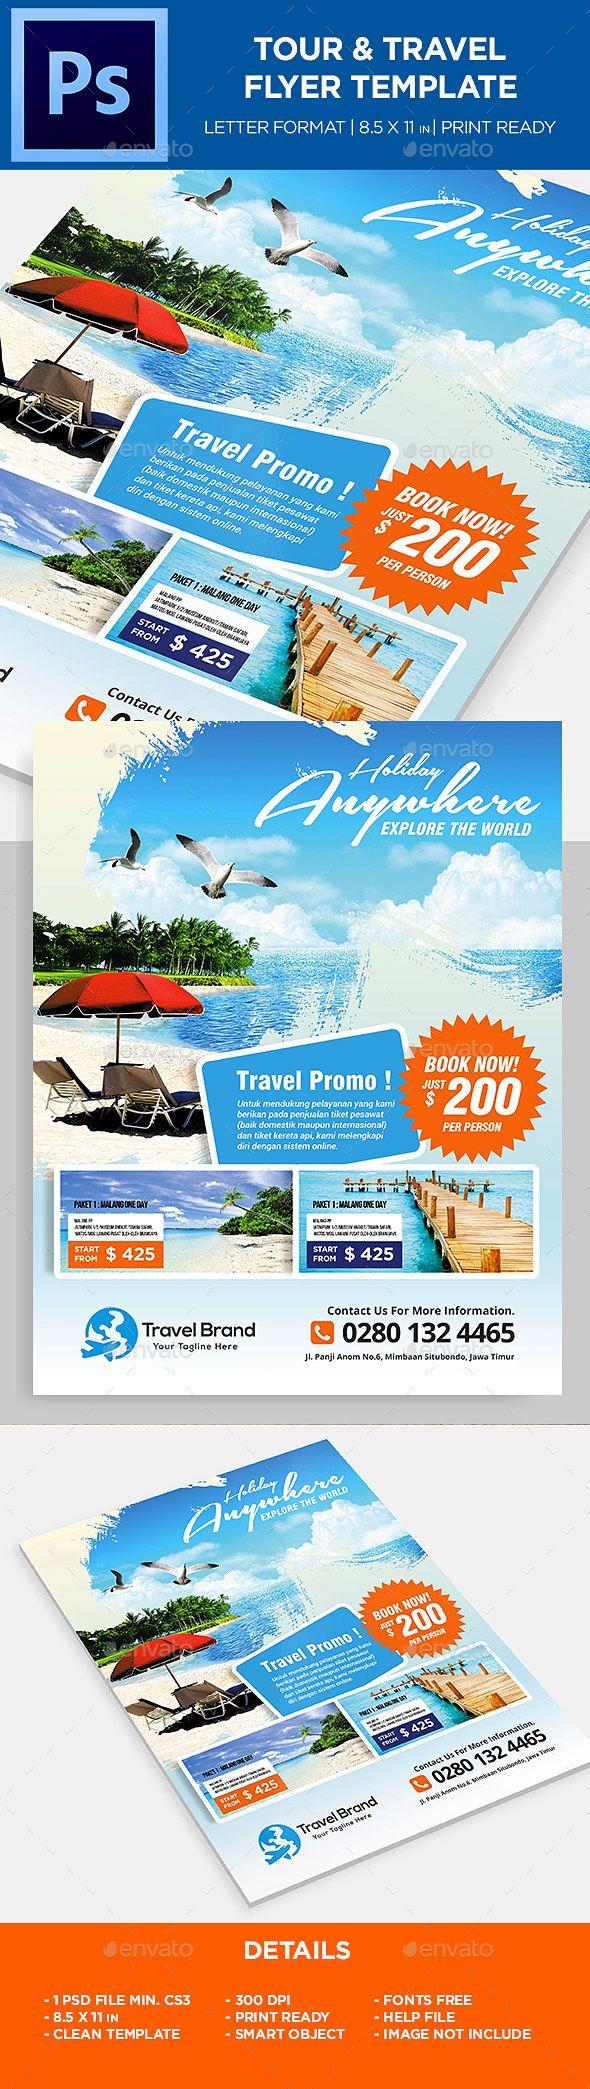 Travel Flyer Ideas For Job Flyer Template Business Flyer Templates